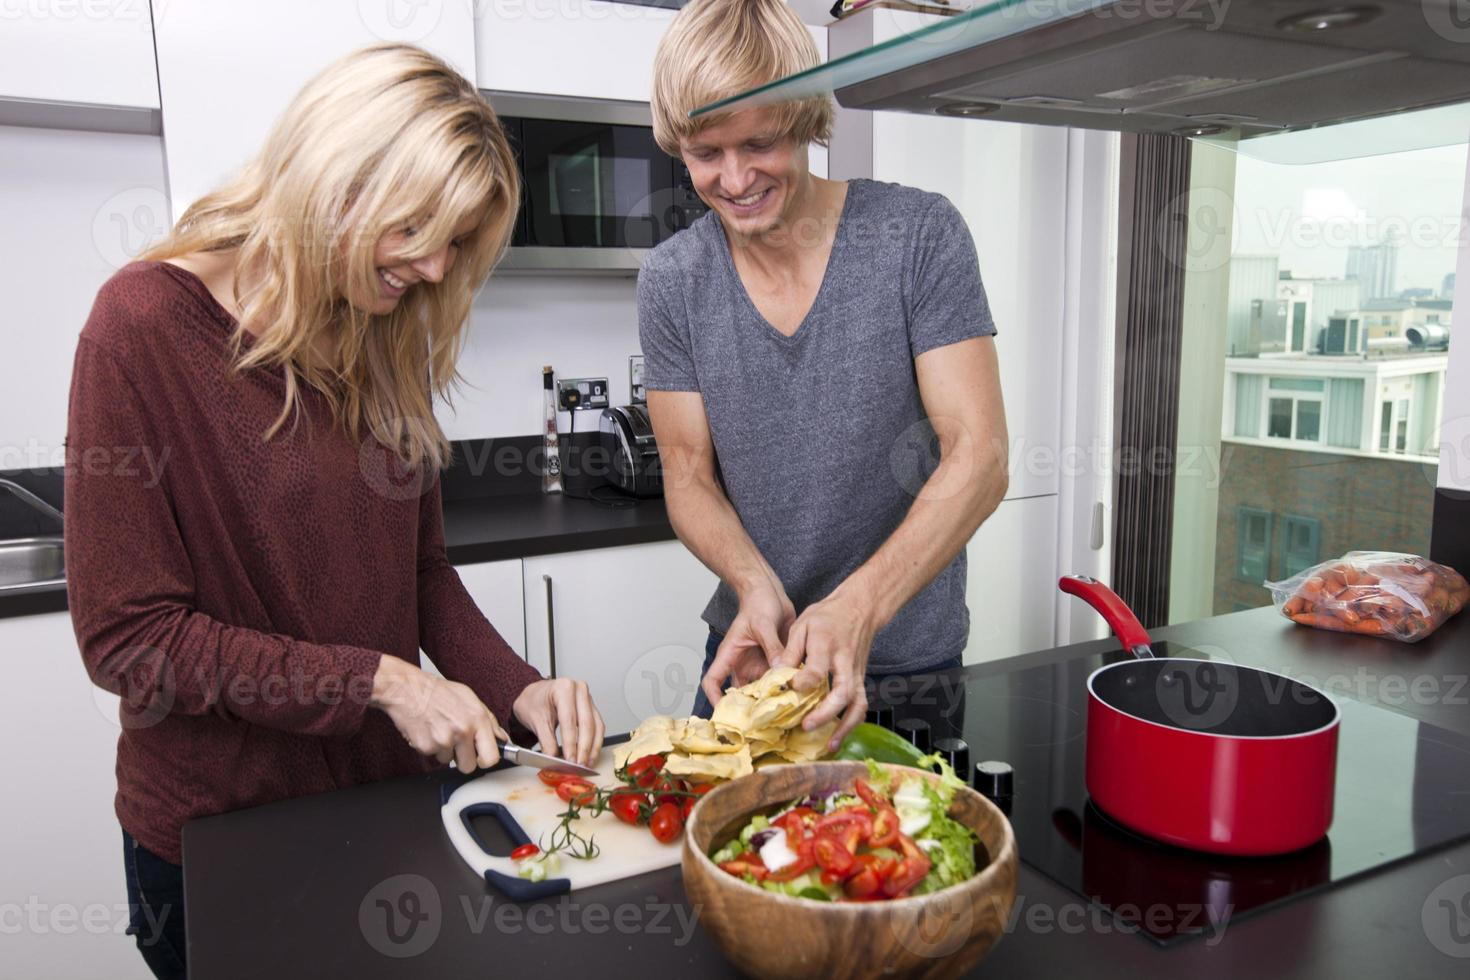 glimlachend Kaukasisch paar dat samen in keuken kookt foto